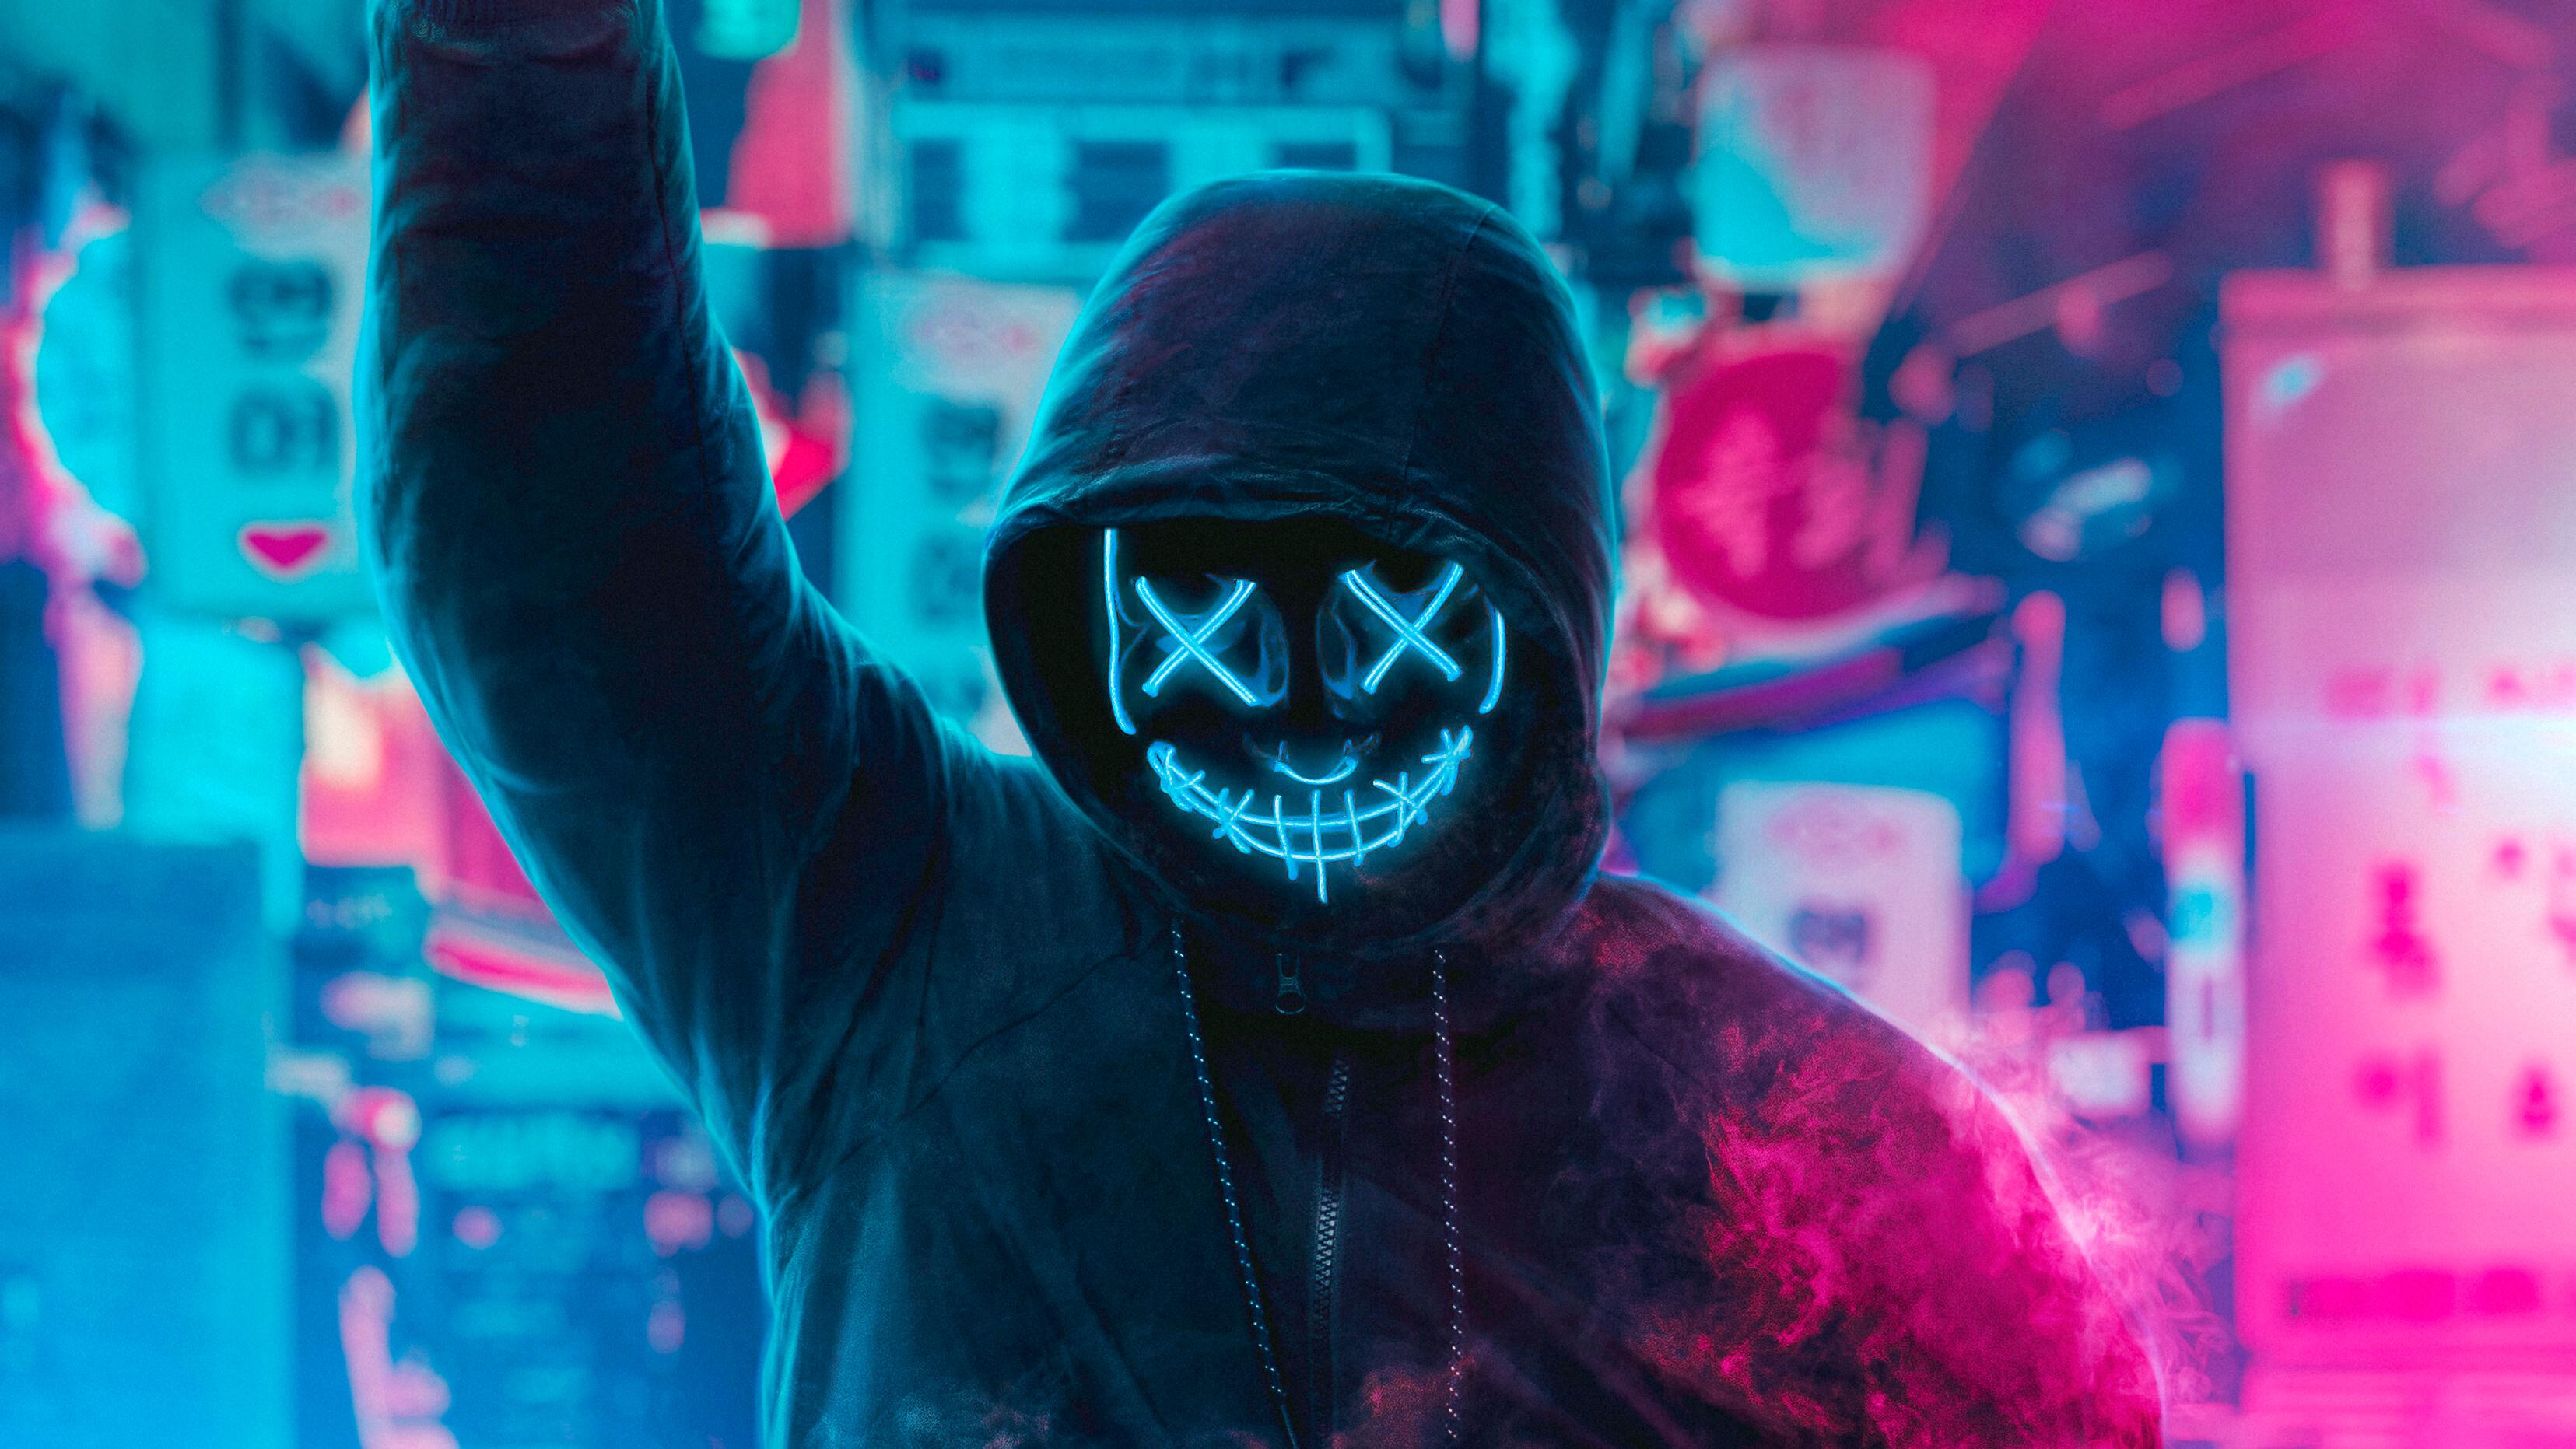 Mask Guy Neon Eye Hd Artist 4k Wallpapers Images